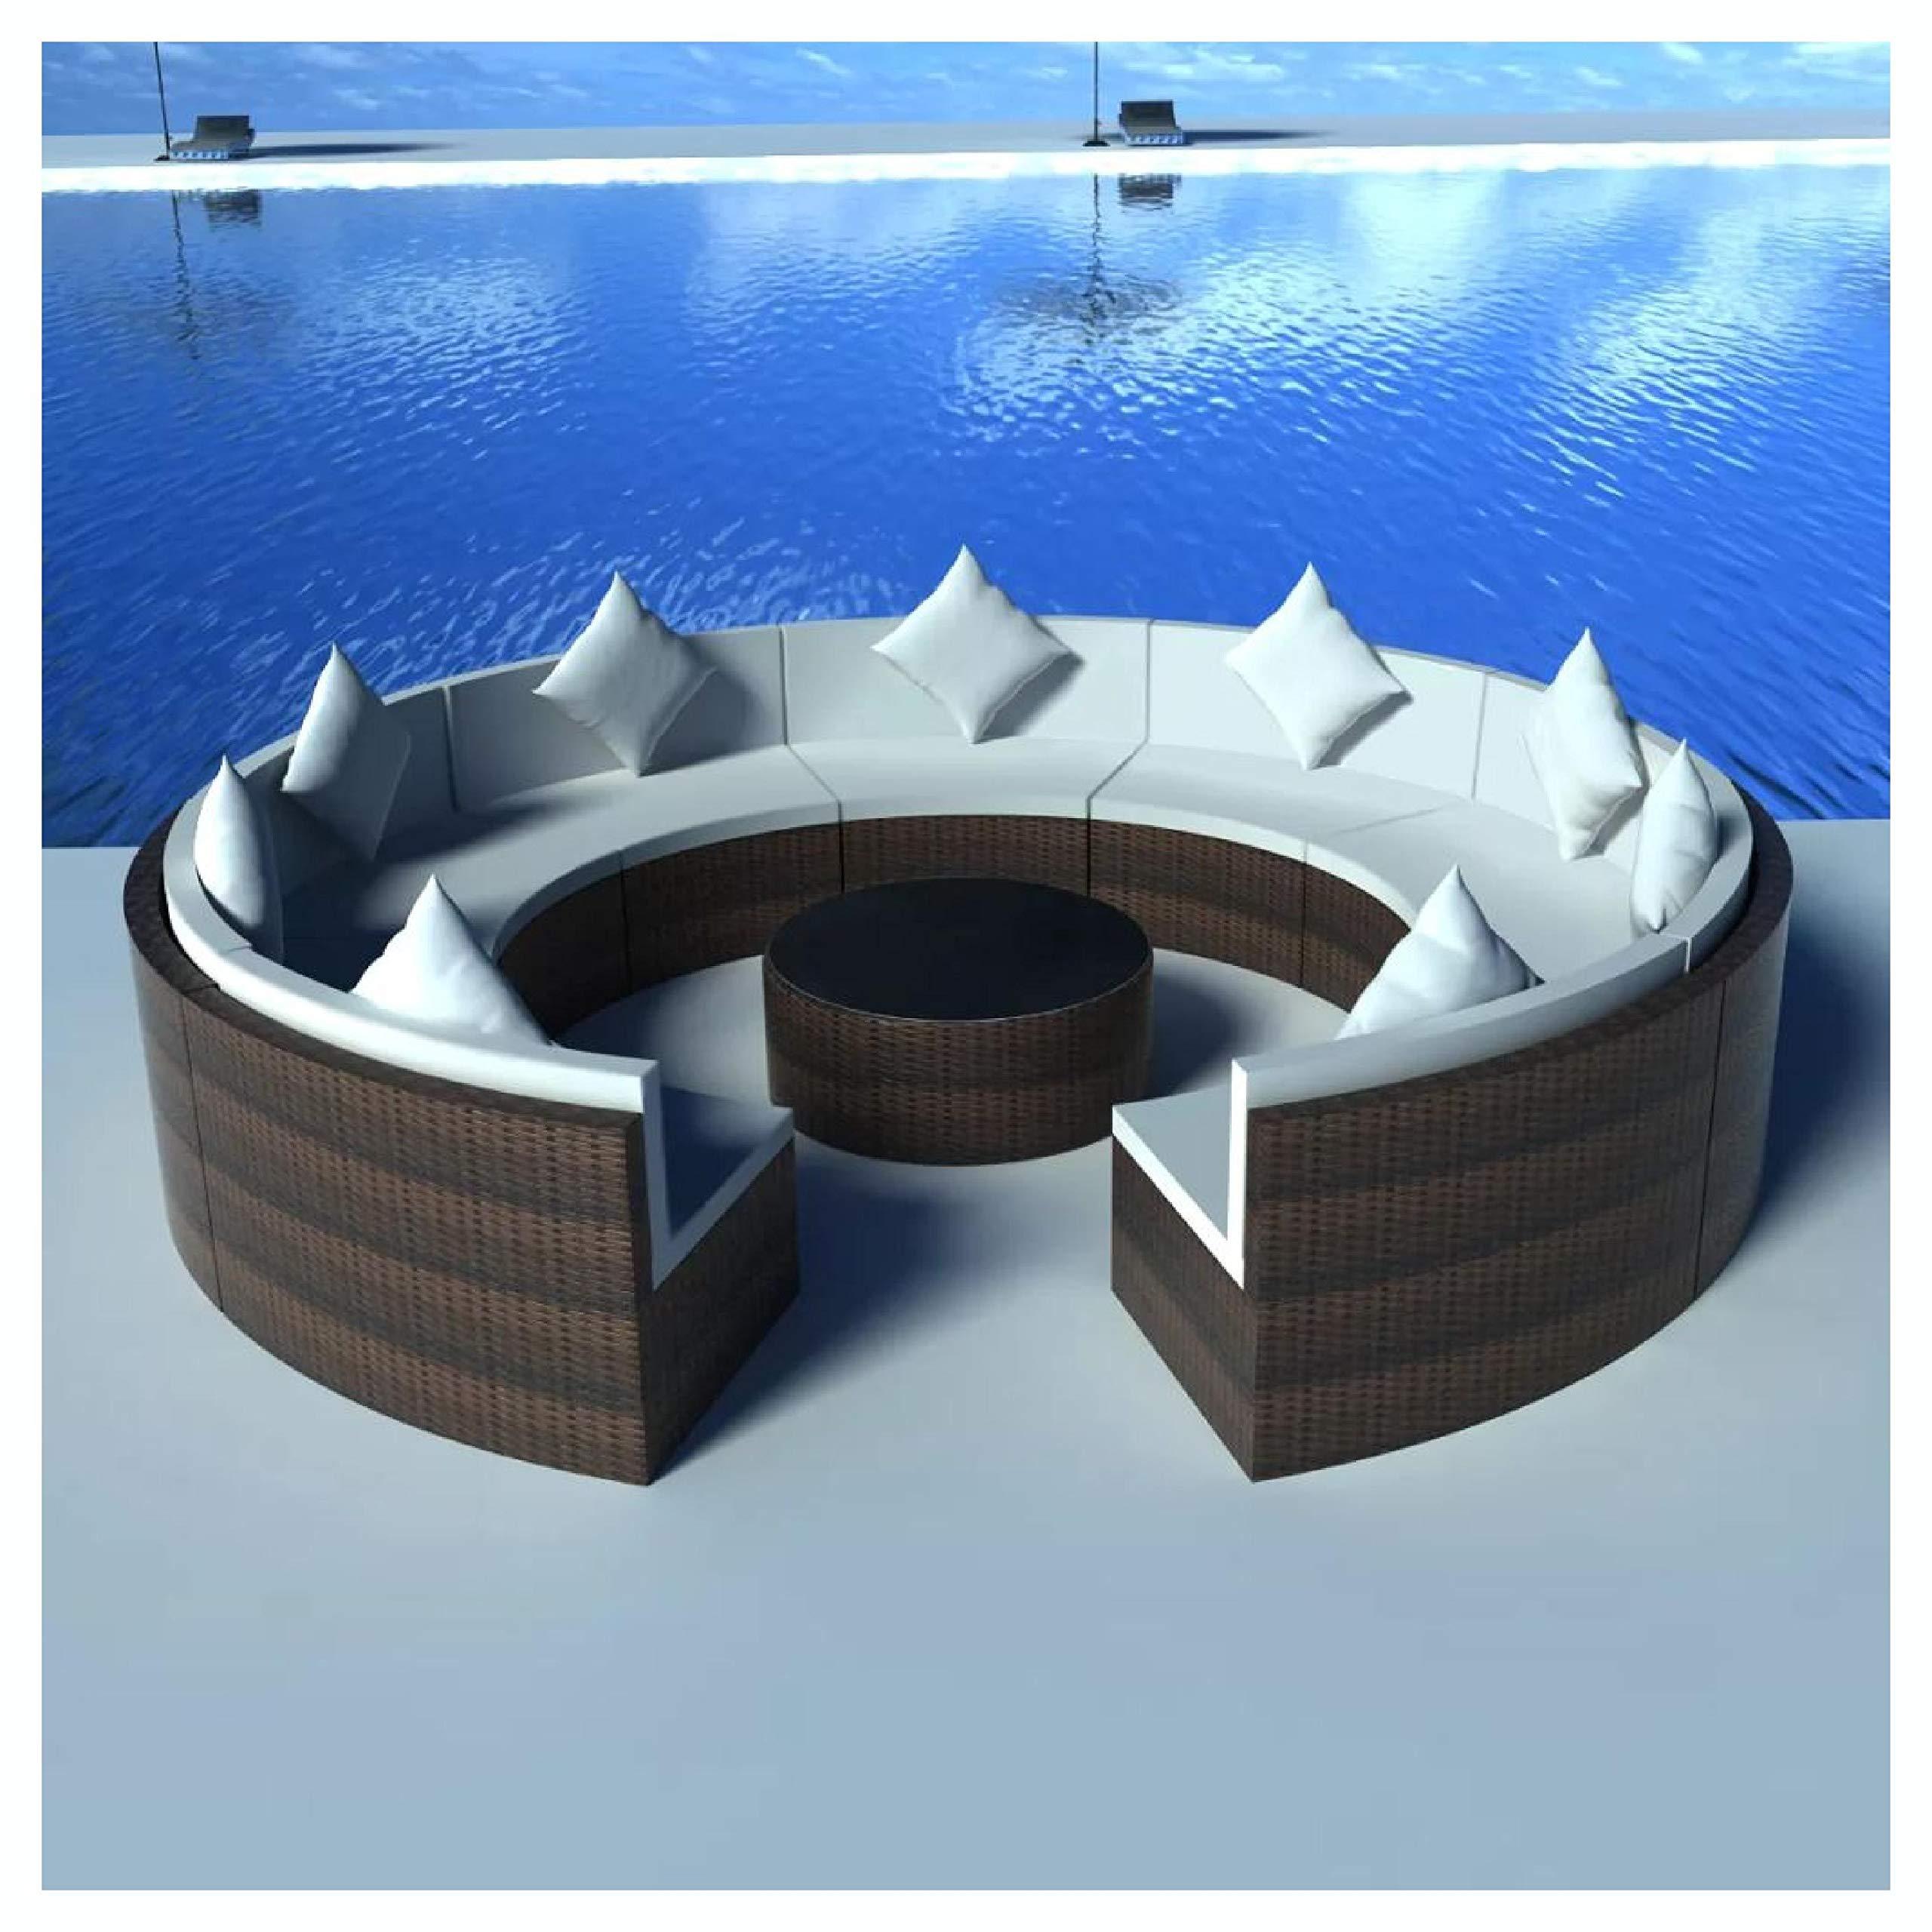 HEATAPPLY Outdoor Furniture Set, 10 Piece Garden Lounge Set with Cushions Poly Rattan Brown by HEATAPPLY